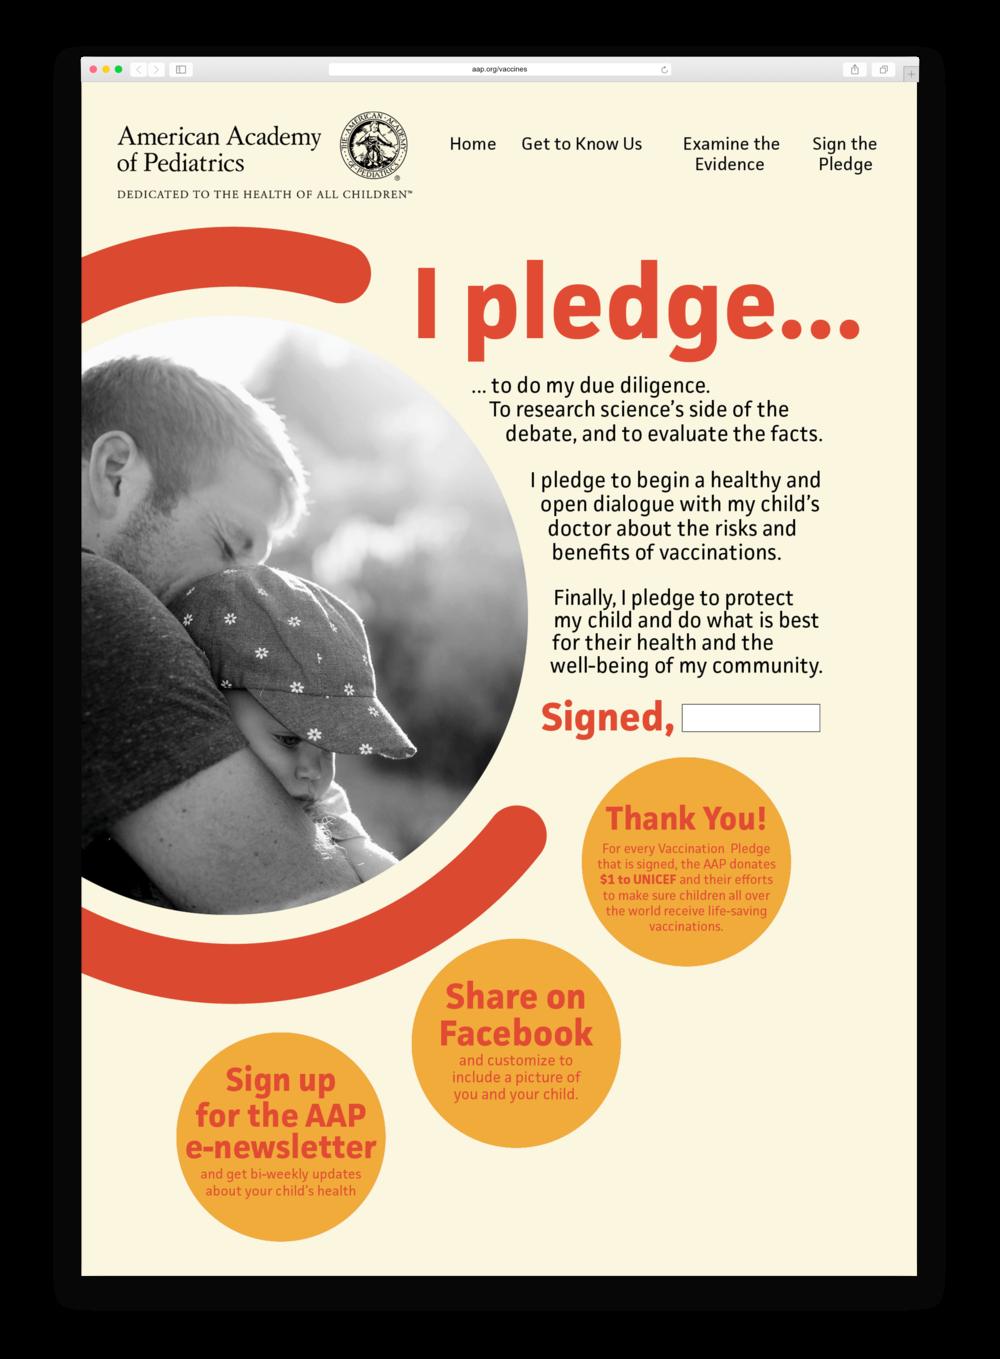 AAP pledge.png